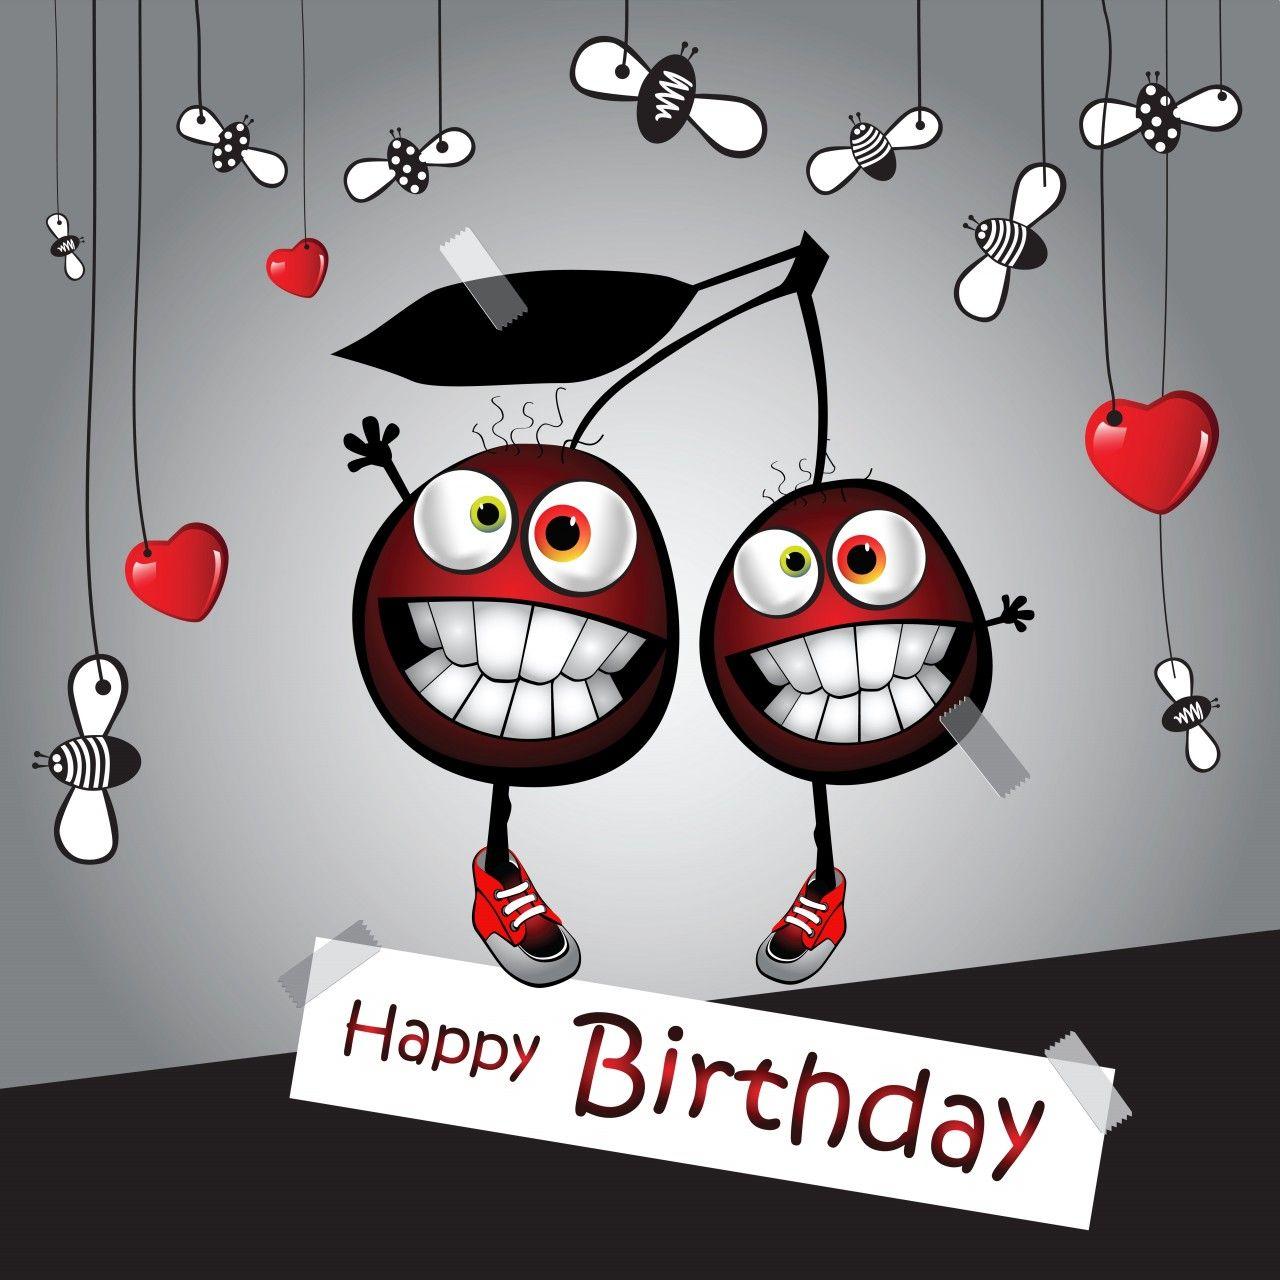 happy birthday funny Free Large Images Happy birthday